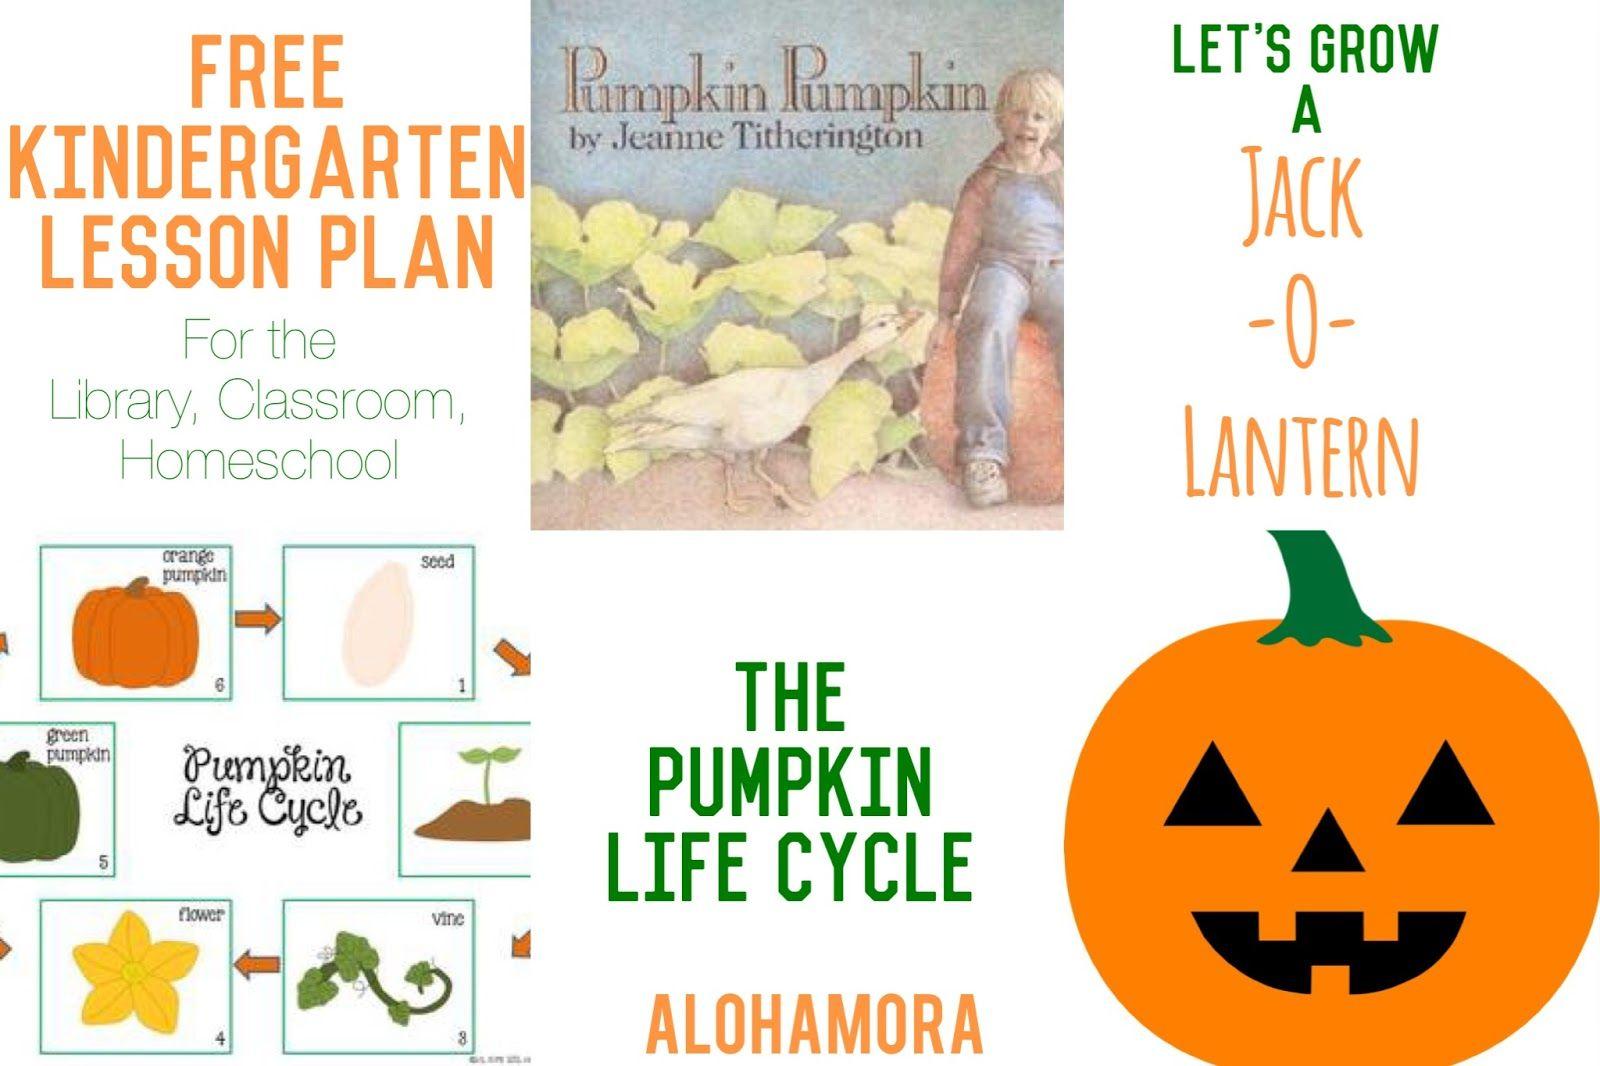 Free Kindergarten Lesson How To Grow A Jack O Lantern The